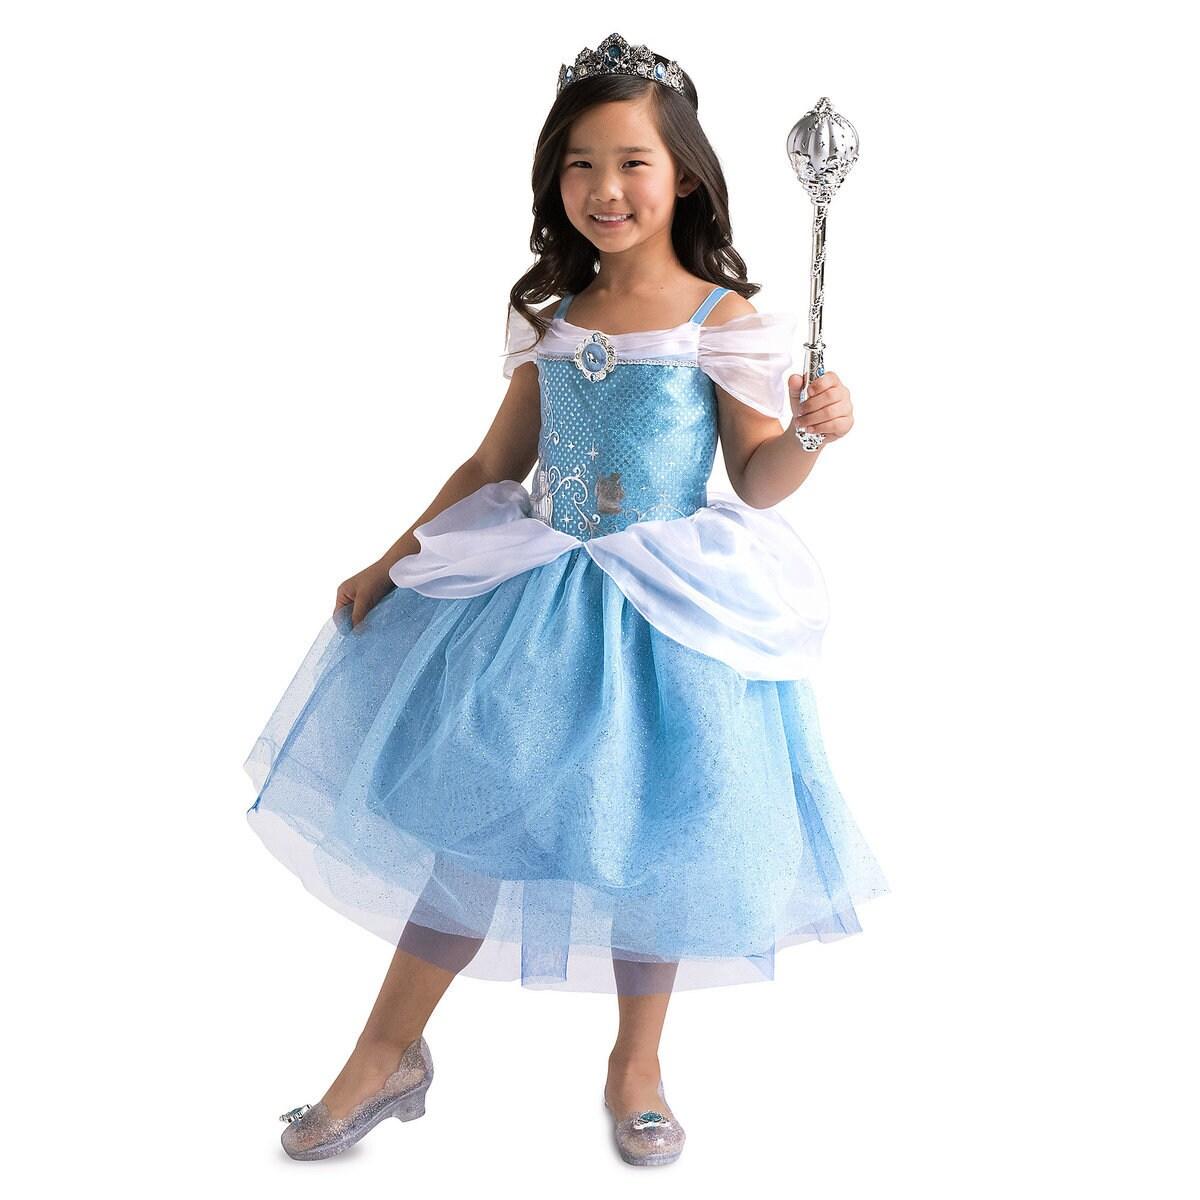 Cinderella Costume for Kids | shopDisney